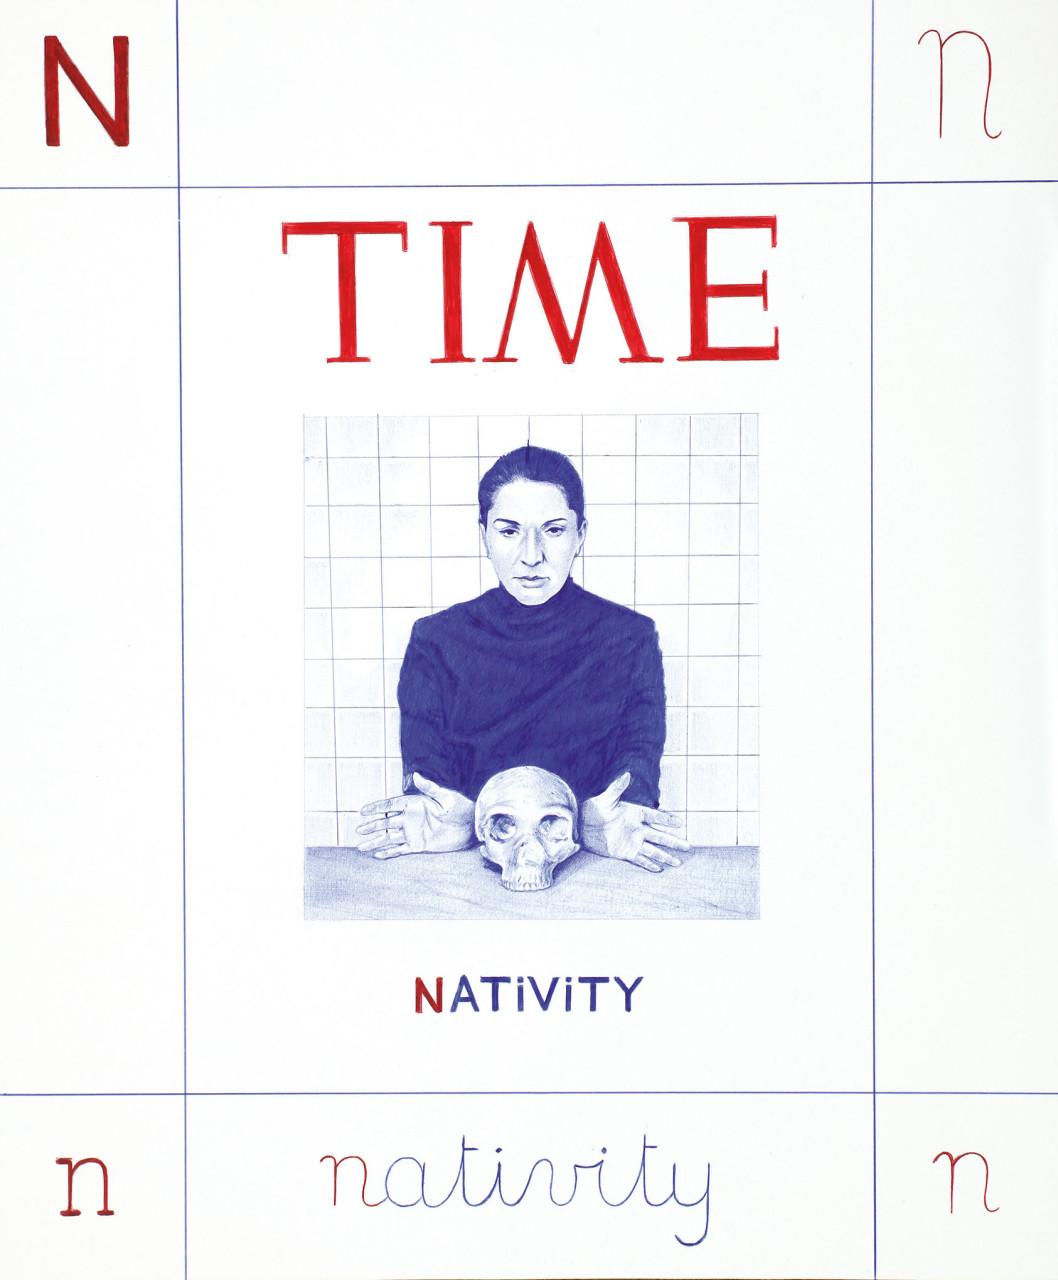 22N-nativity_bassa